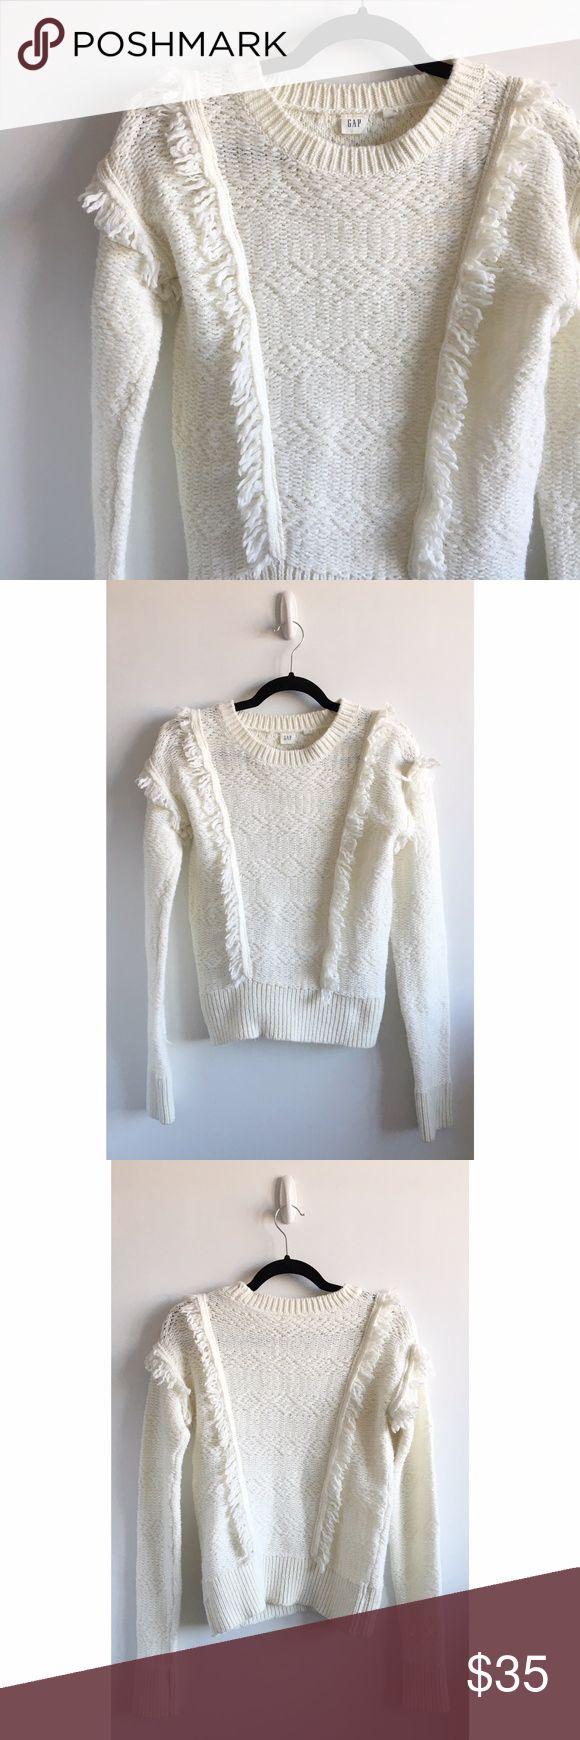 Black distressed sweater NWT   Distressed sweaters